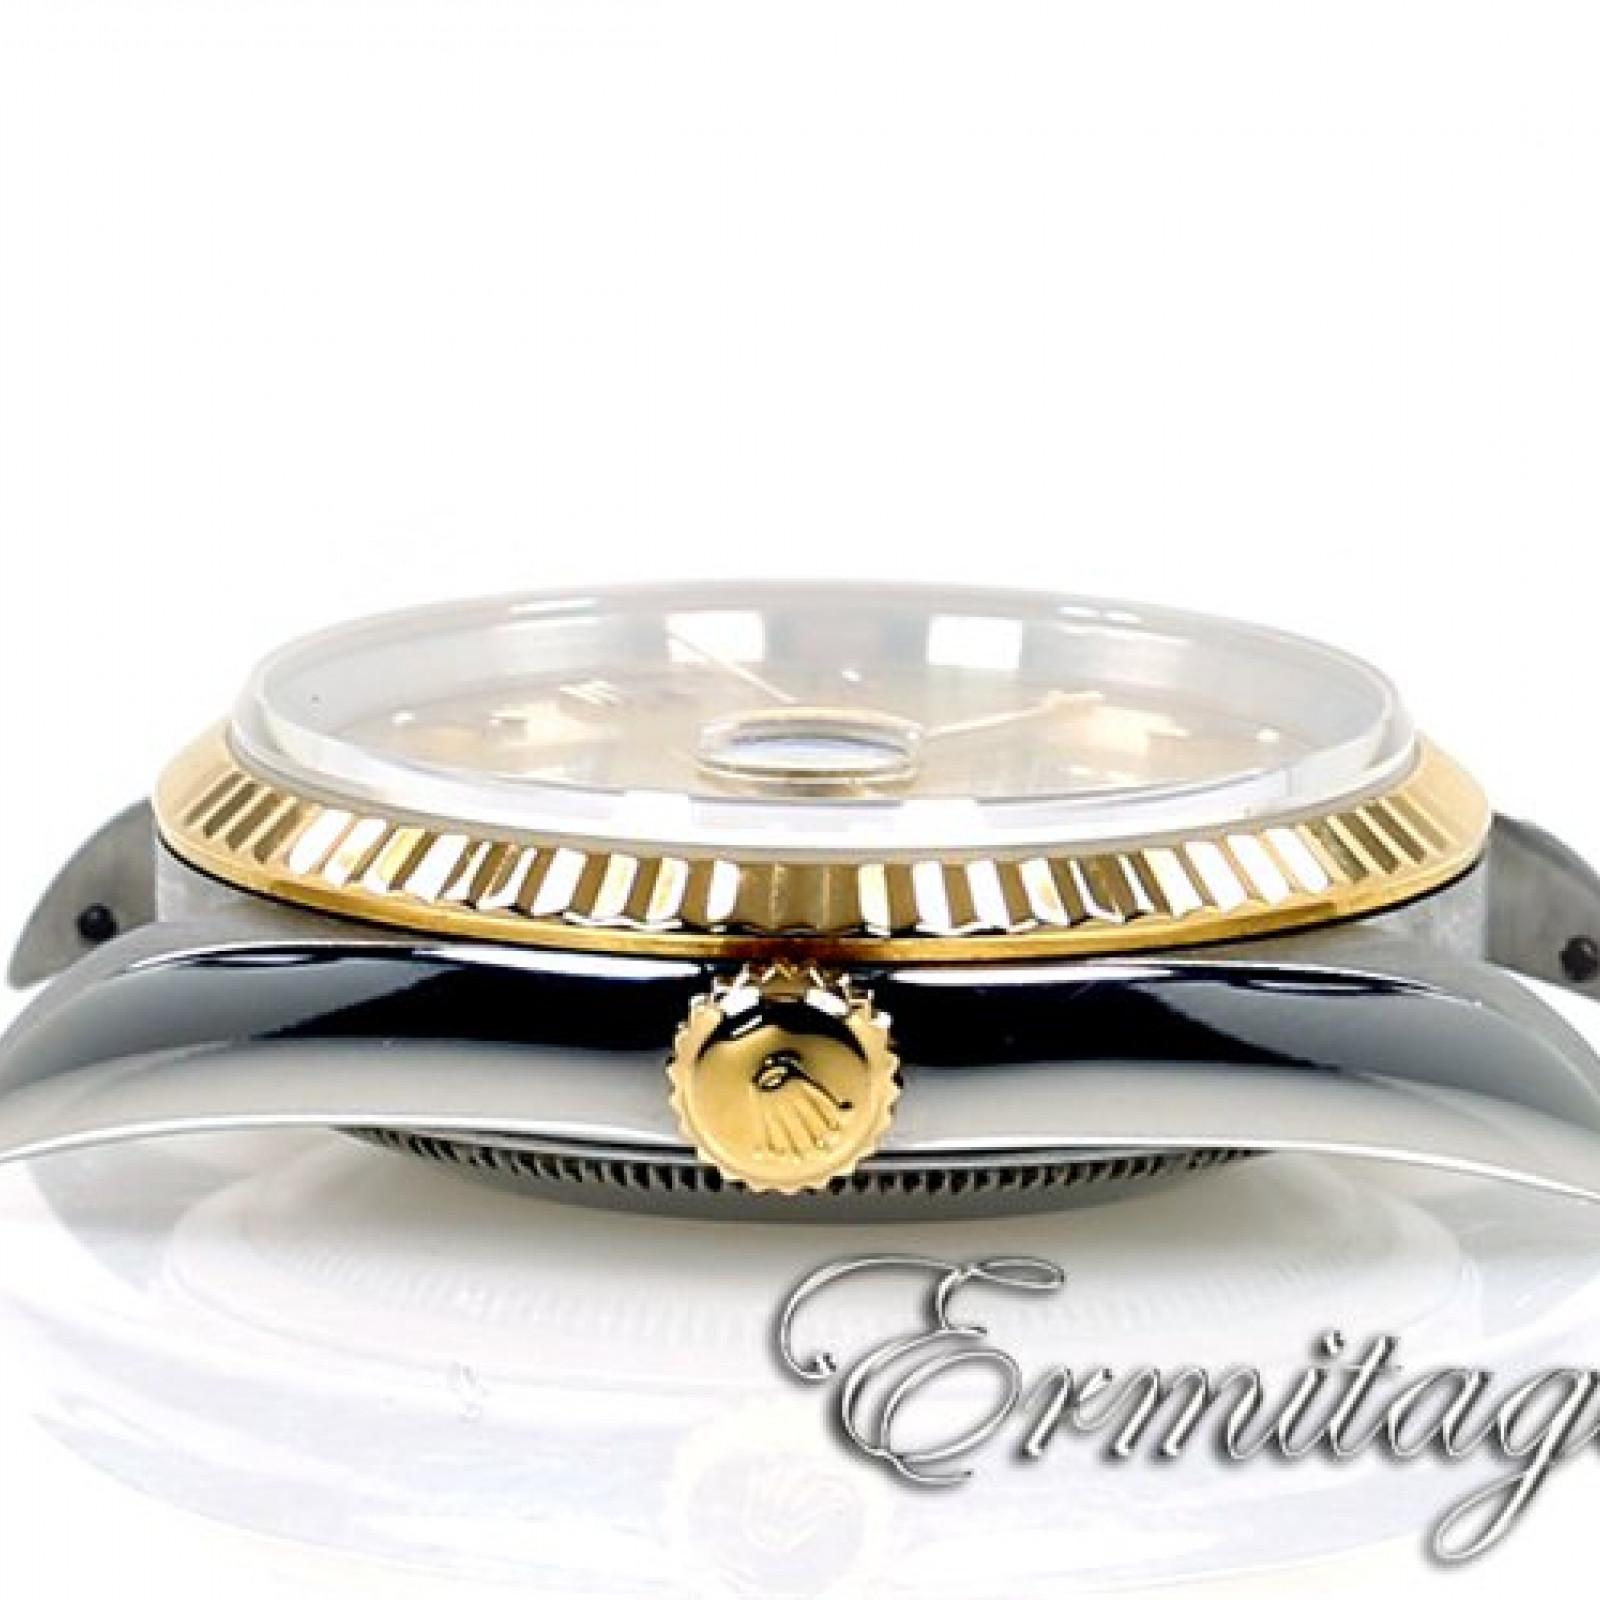 Rolex Datejust 16233 Gold & Steel Champagne